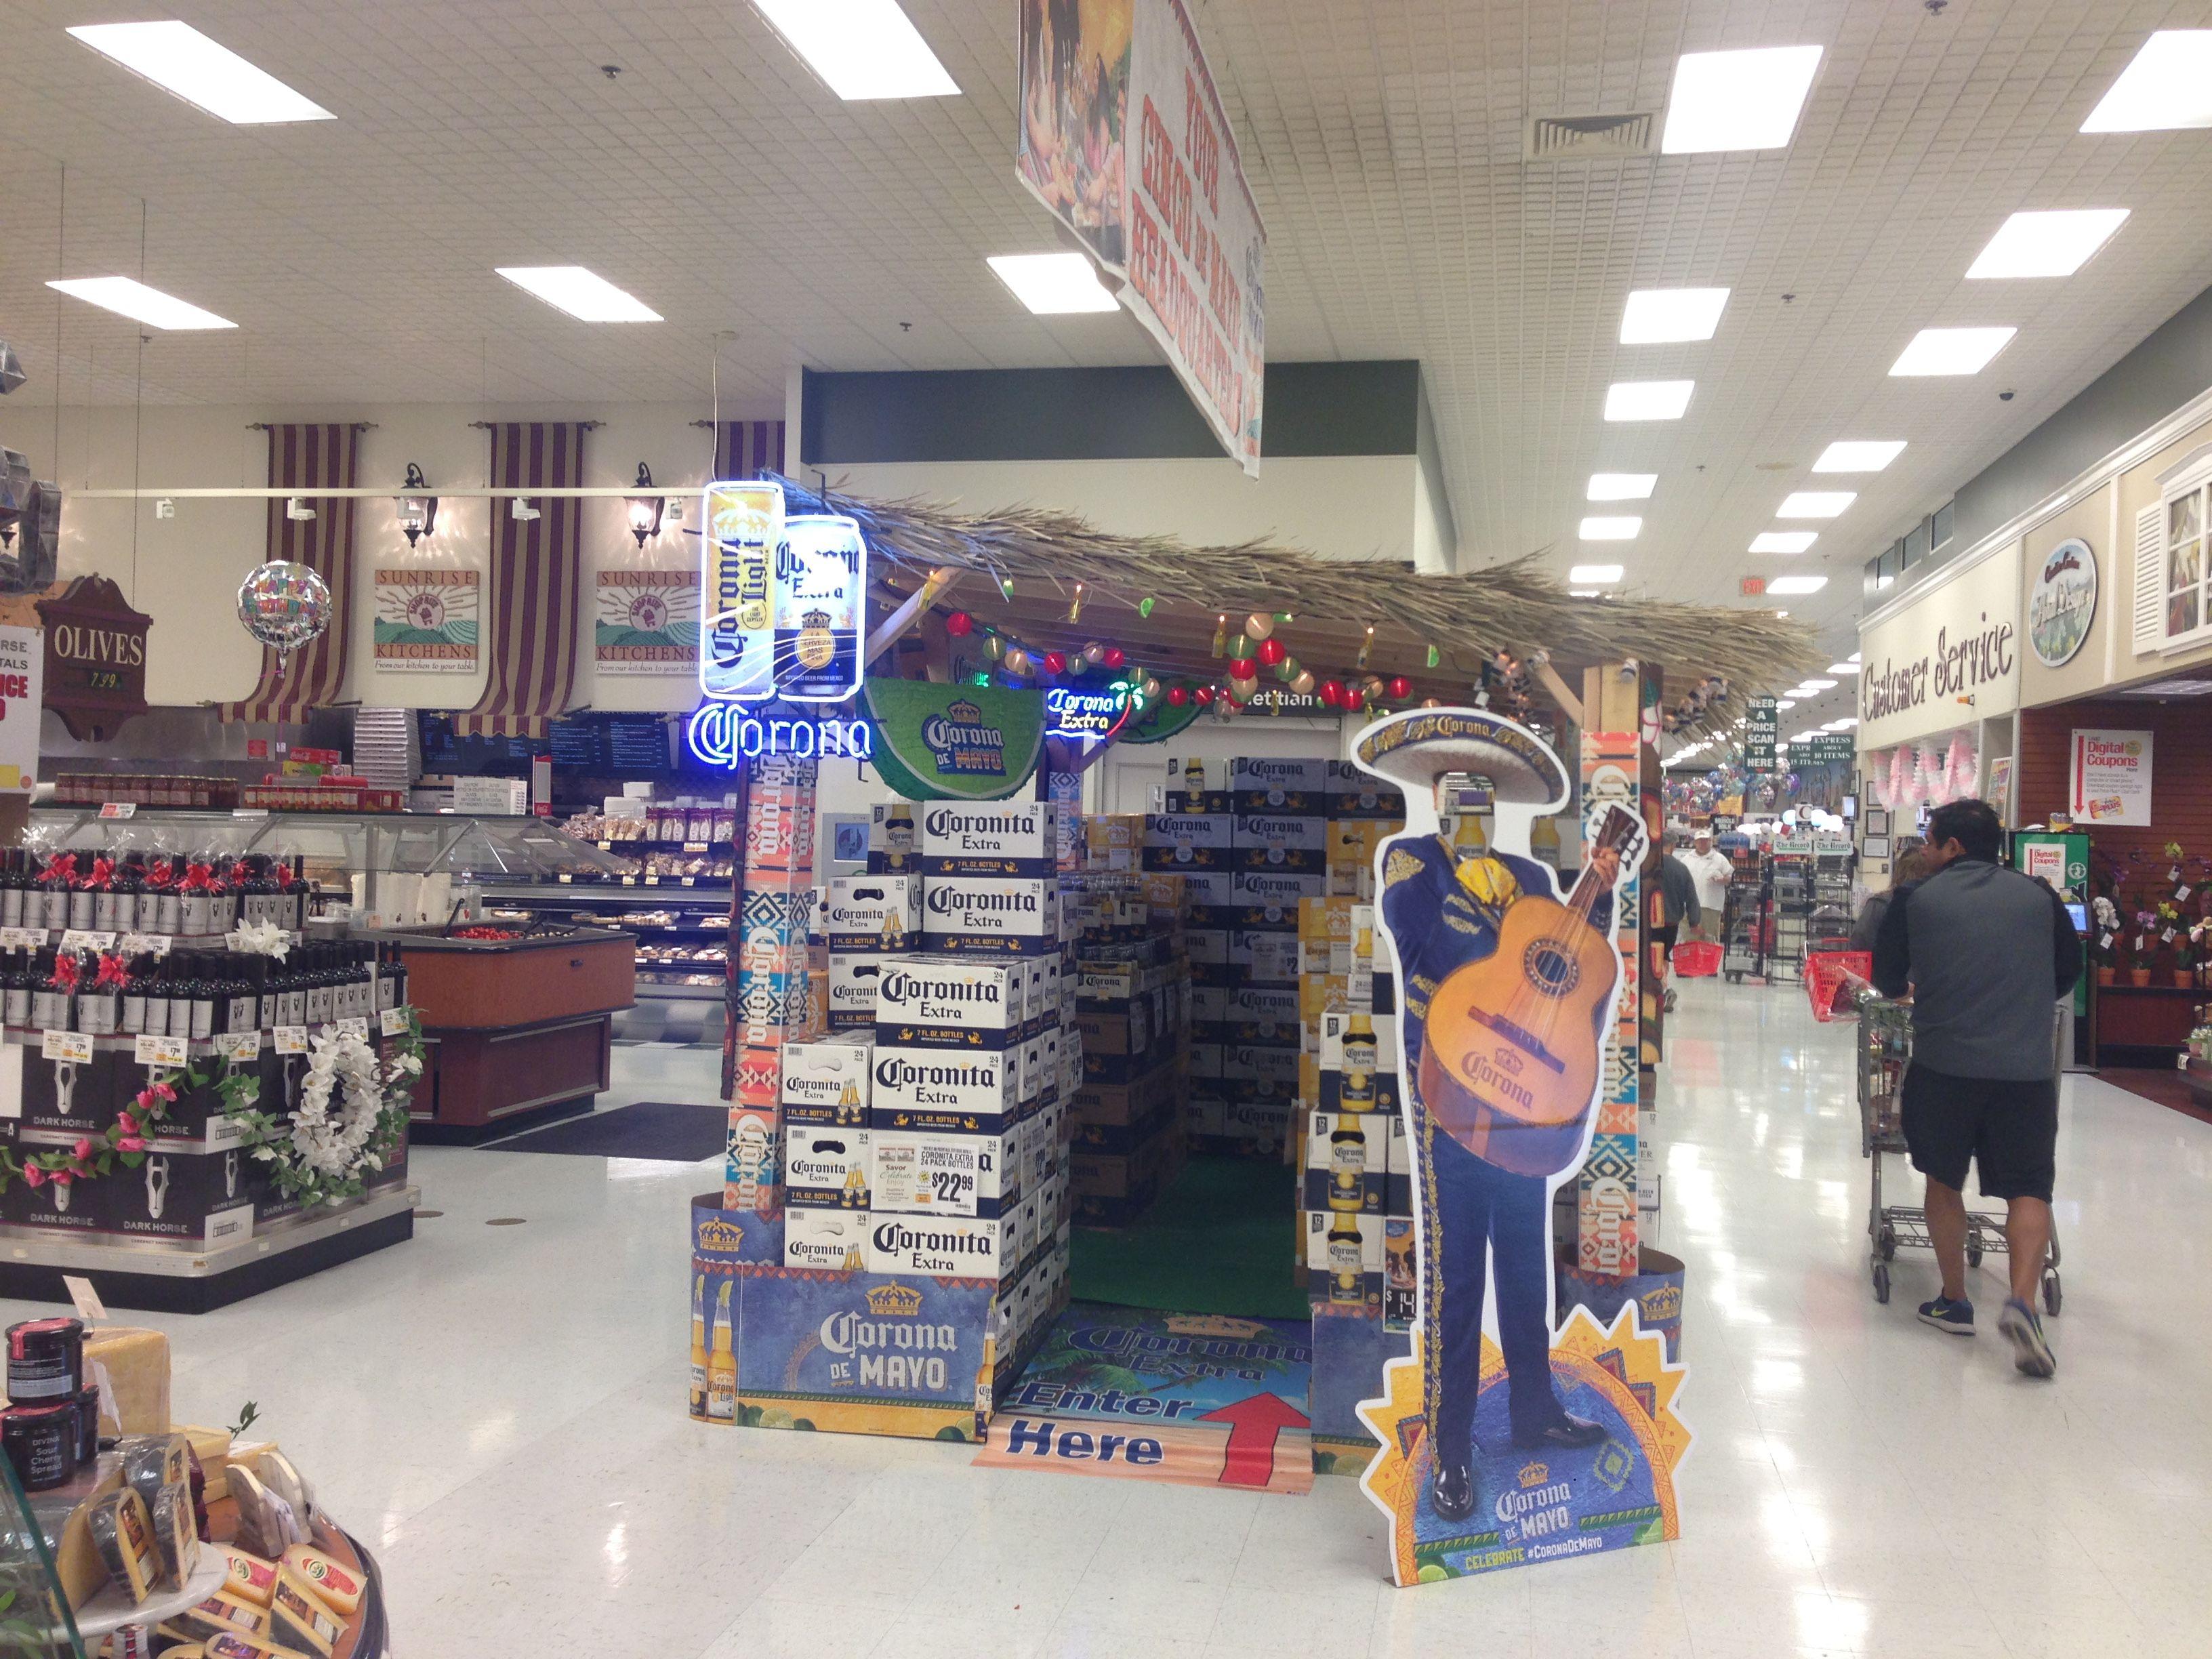 Corona Display ShopRite Parsippany, NJ Retail display